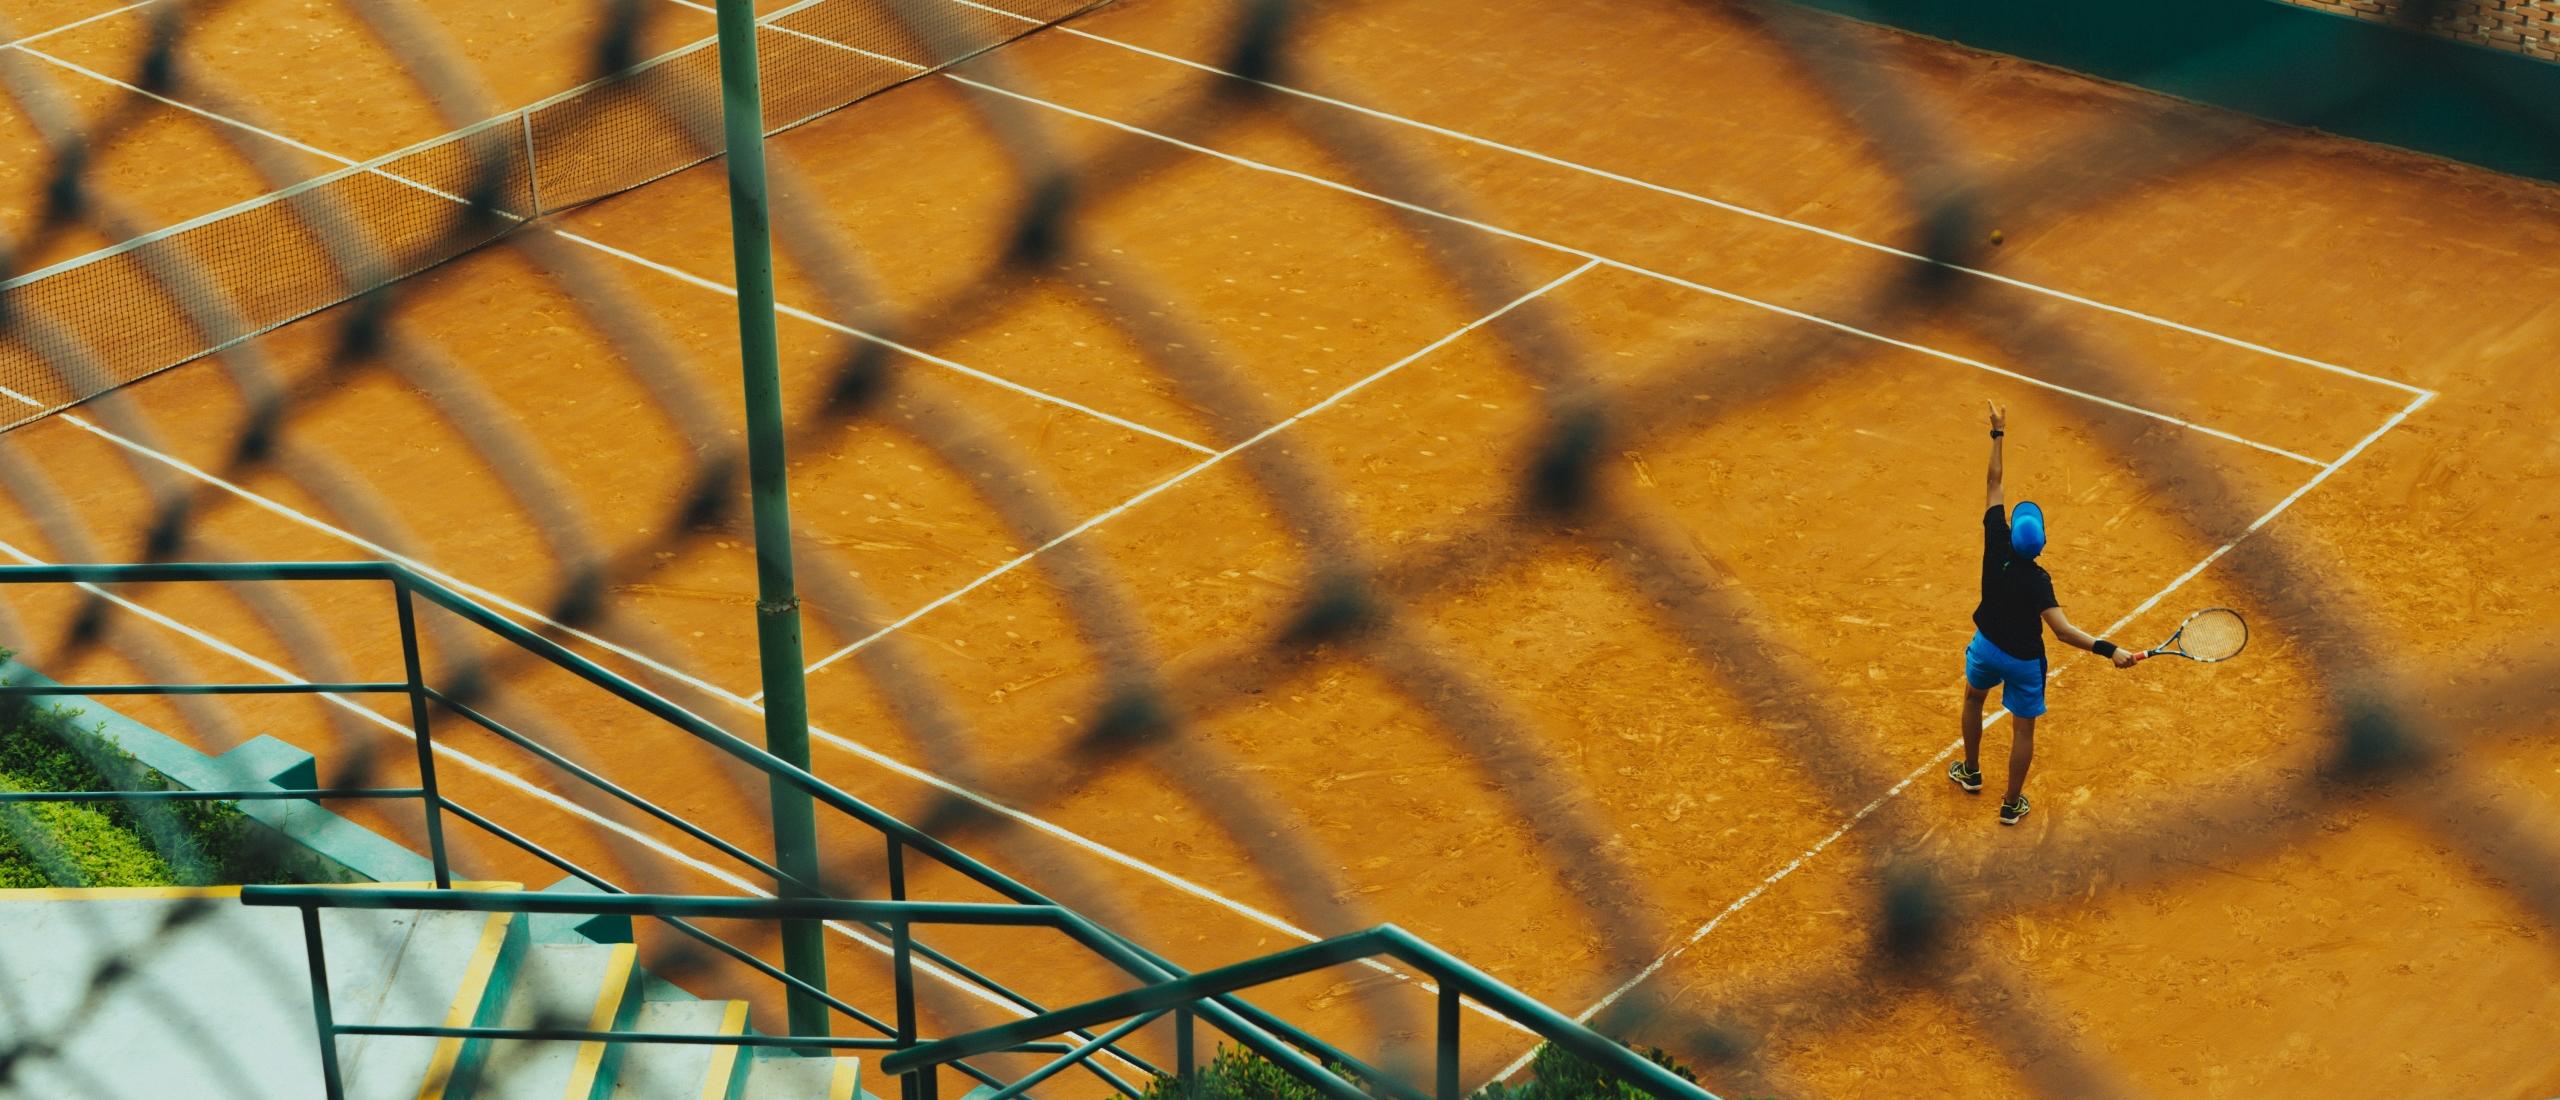 Tennis smash doesn't work